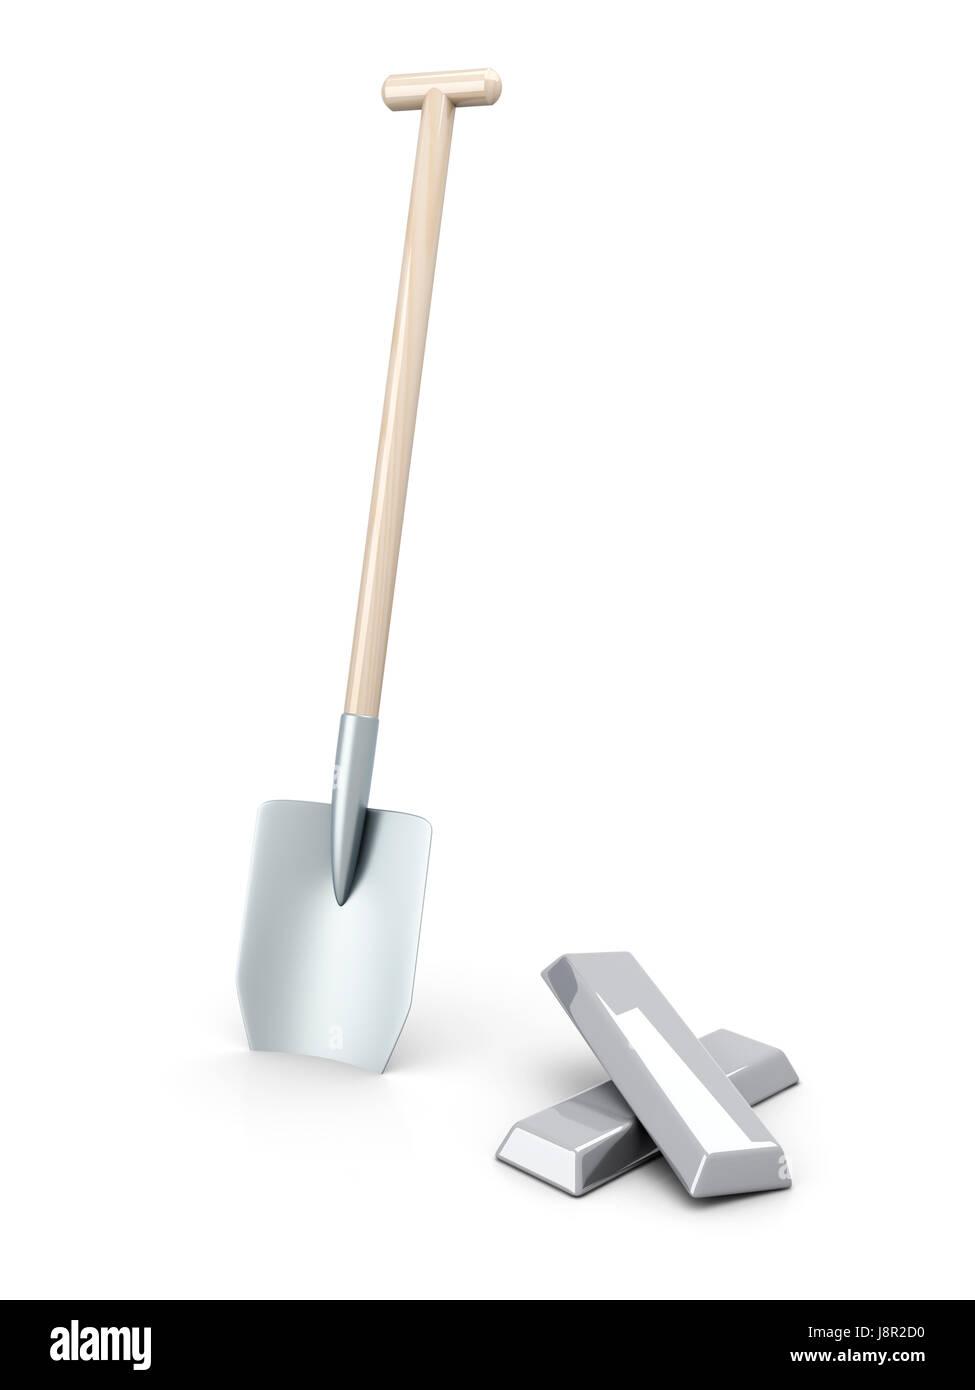 tool, isolated, garden, silver, stock exchange, stock-exchange, emporium, - Stock Image